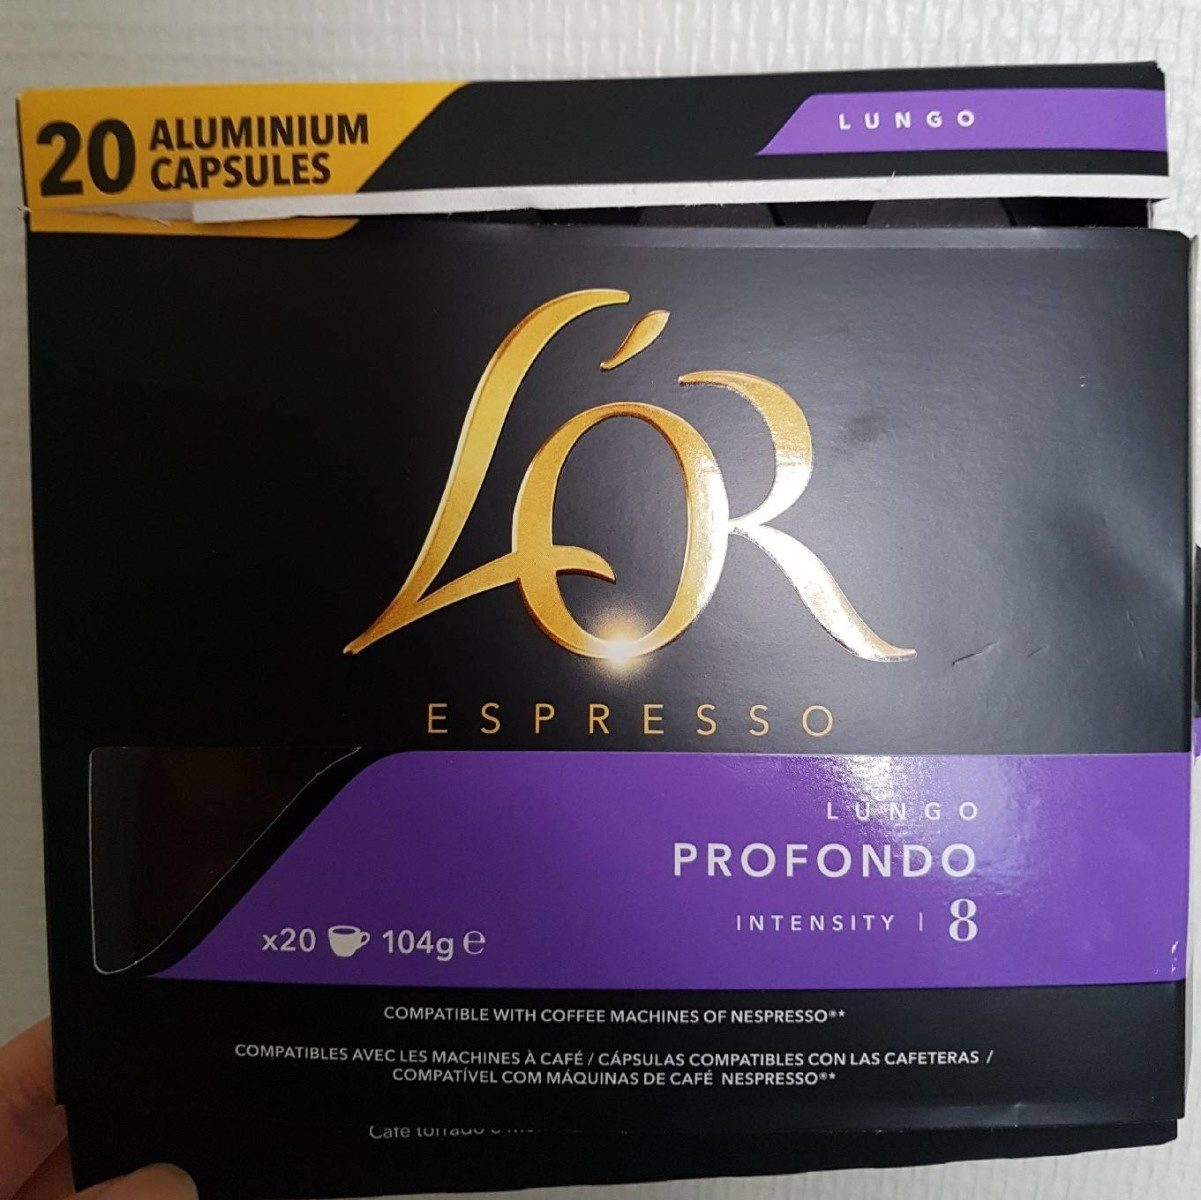 L'or Espresso lungo profondo 20 capsules - Product - fr